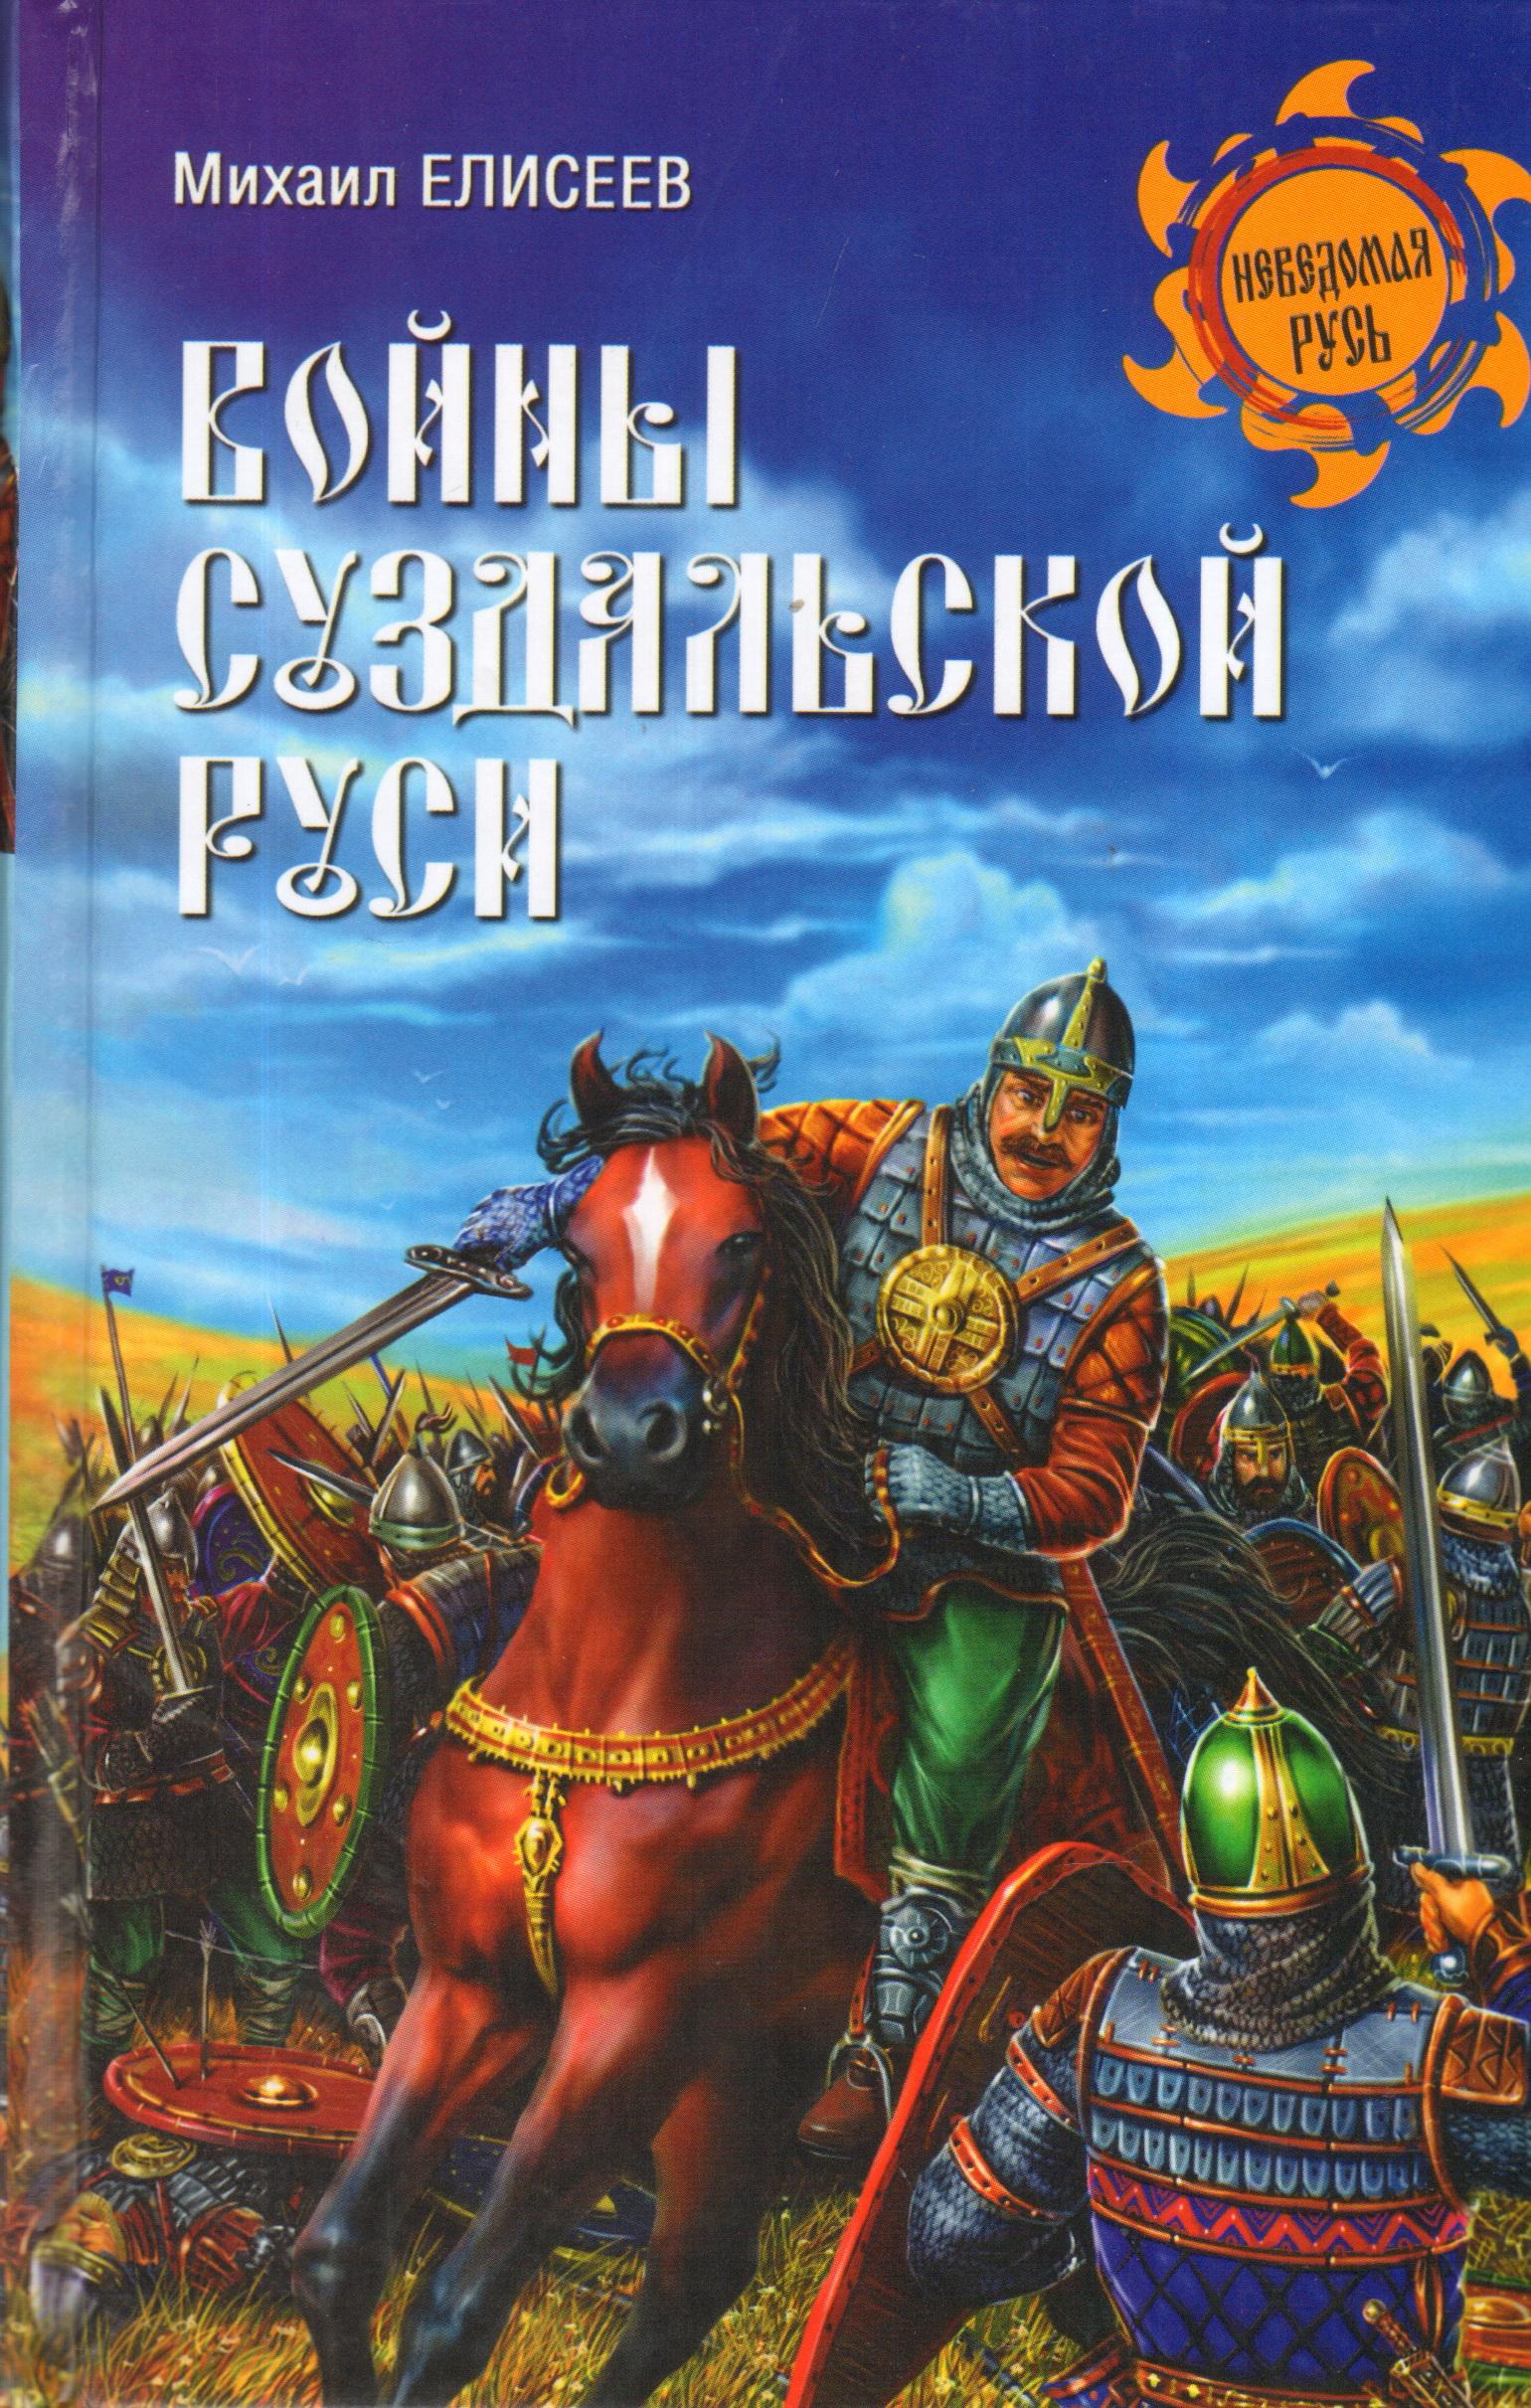 НРУС Войны Суздальской Руси (12+)